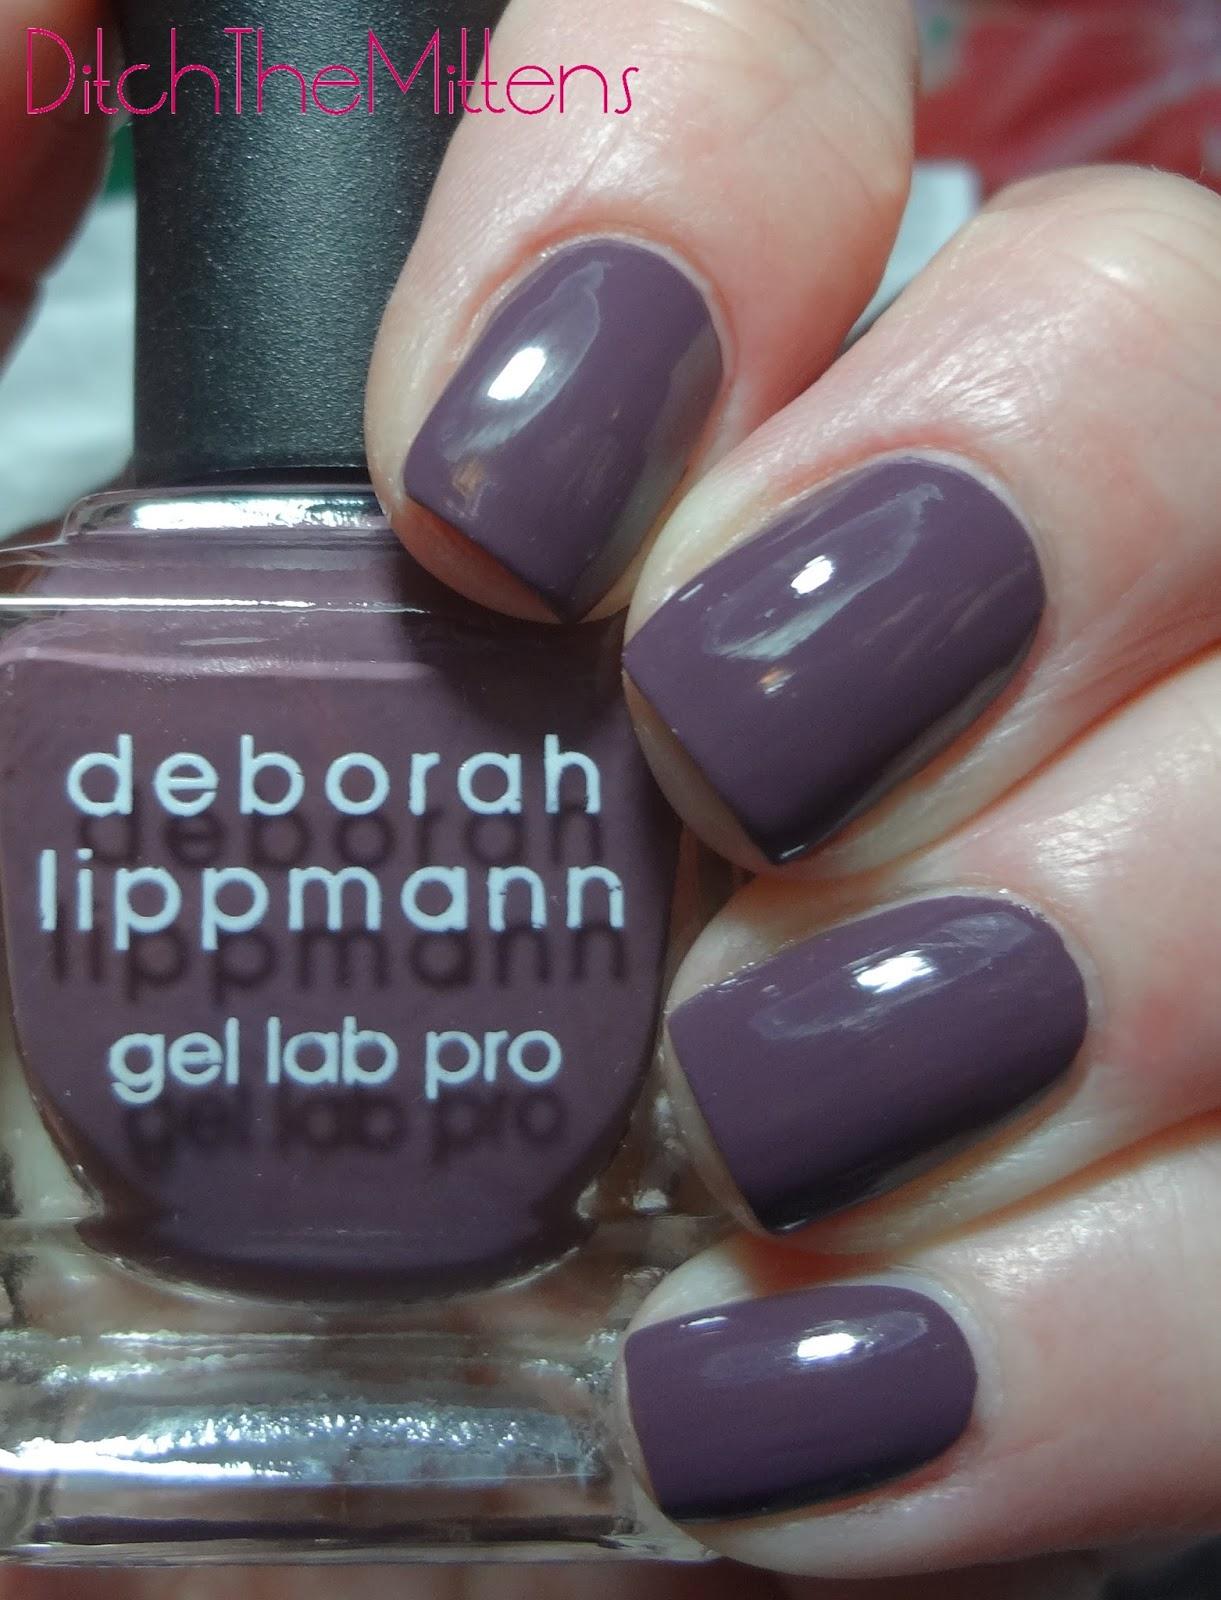 Ditch the Mittens: Deborah Lippmann Gel Lab Pro - Love Hangover